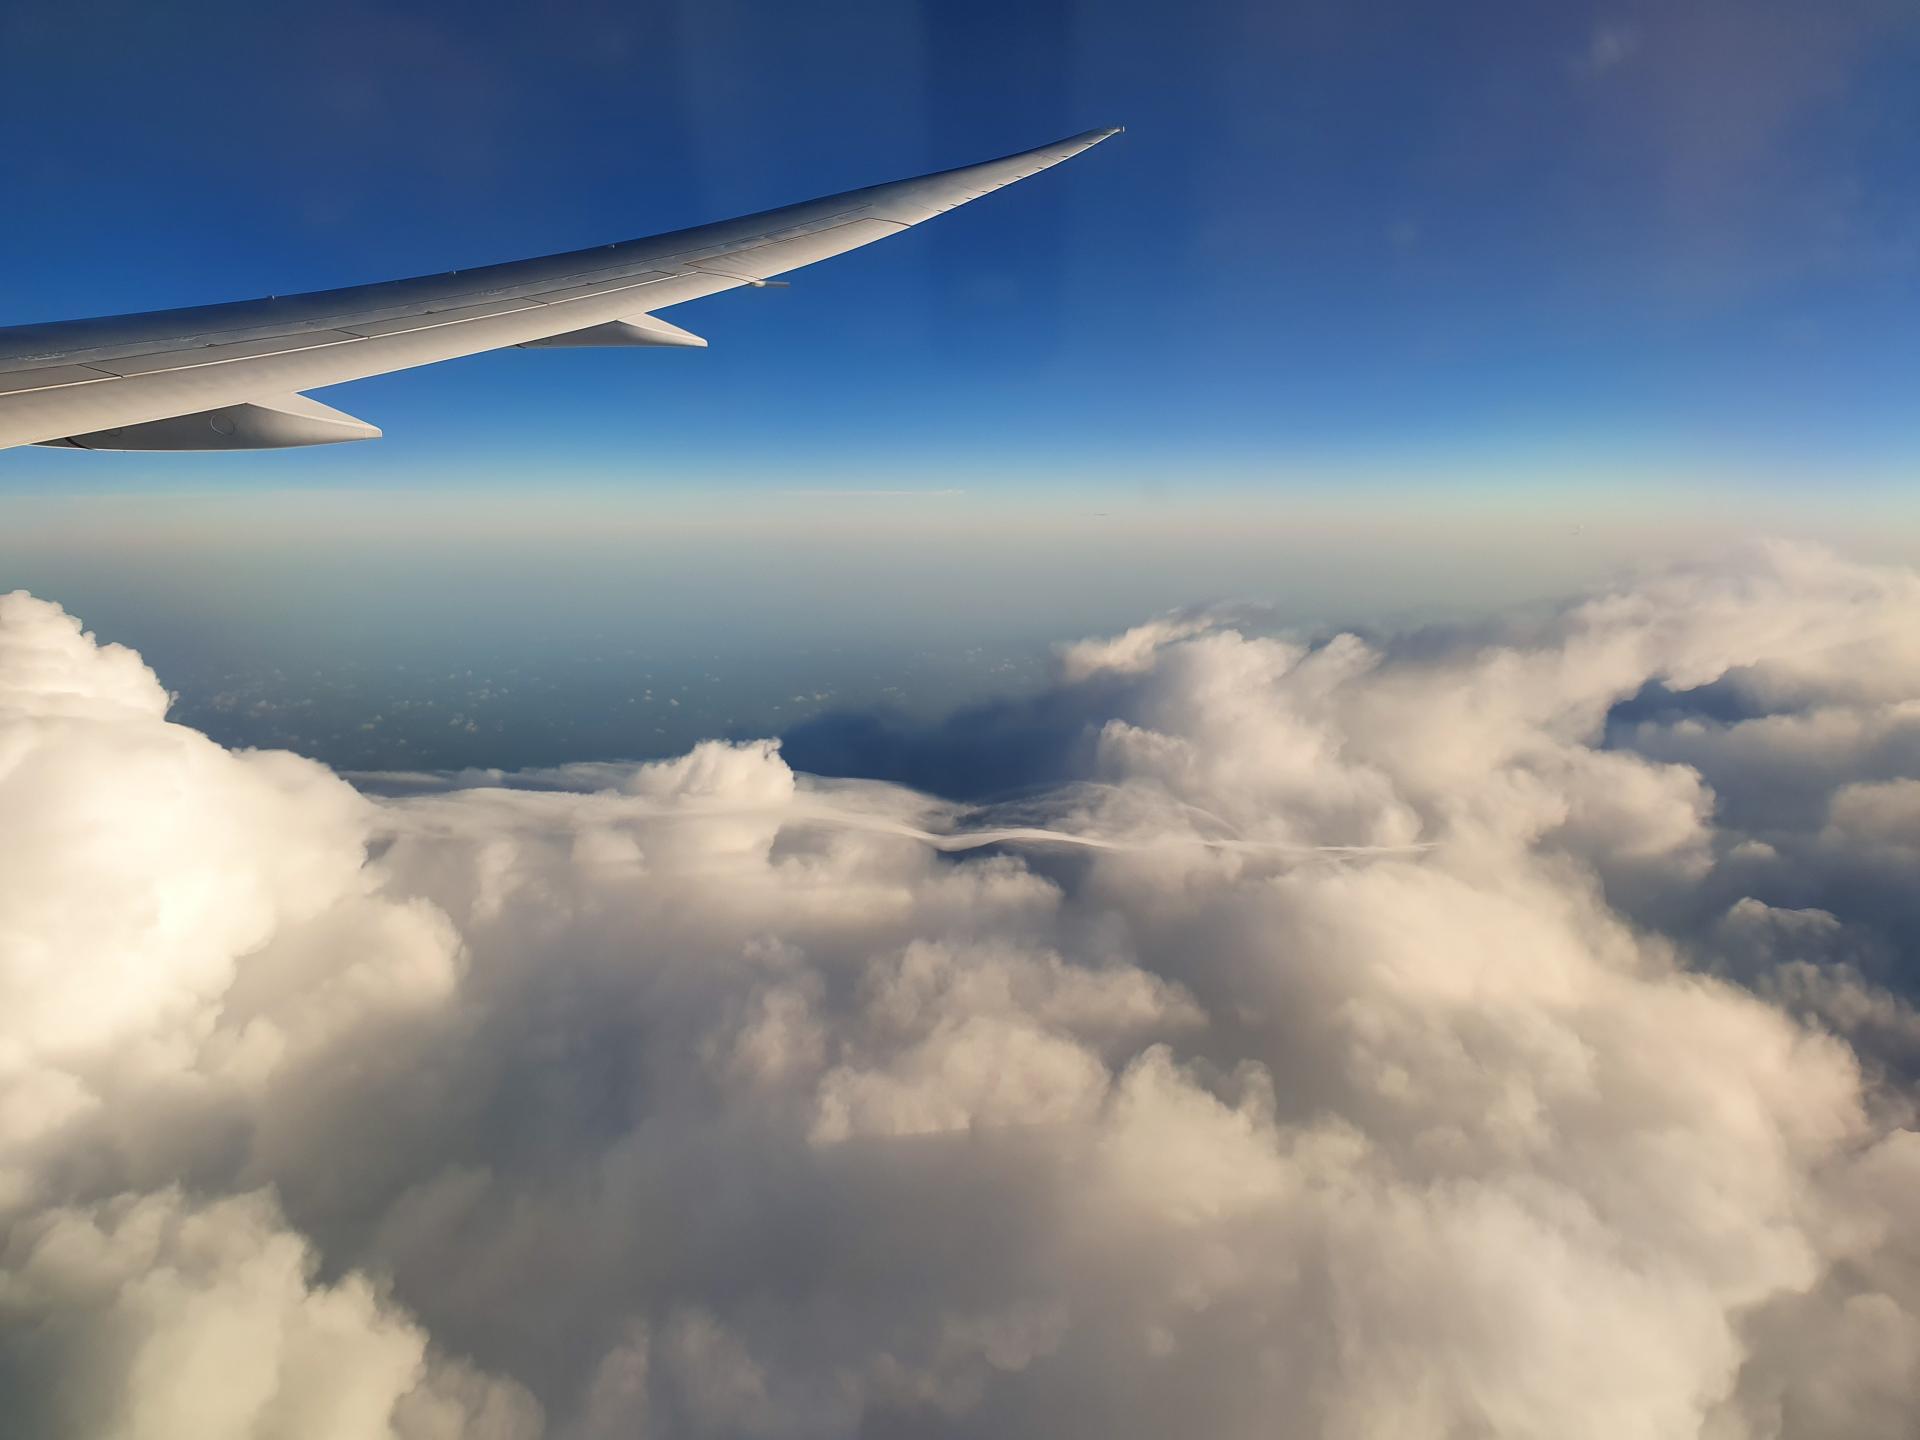 облака под крылом самолета